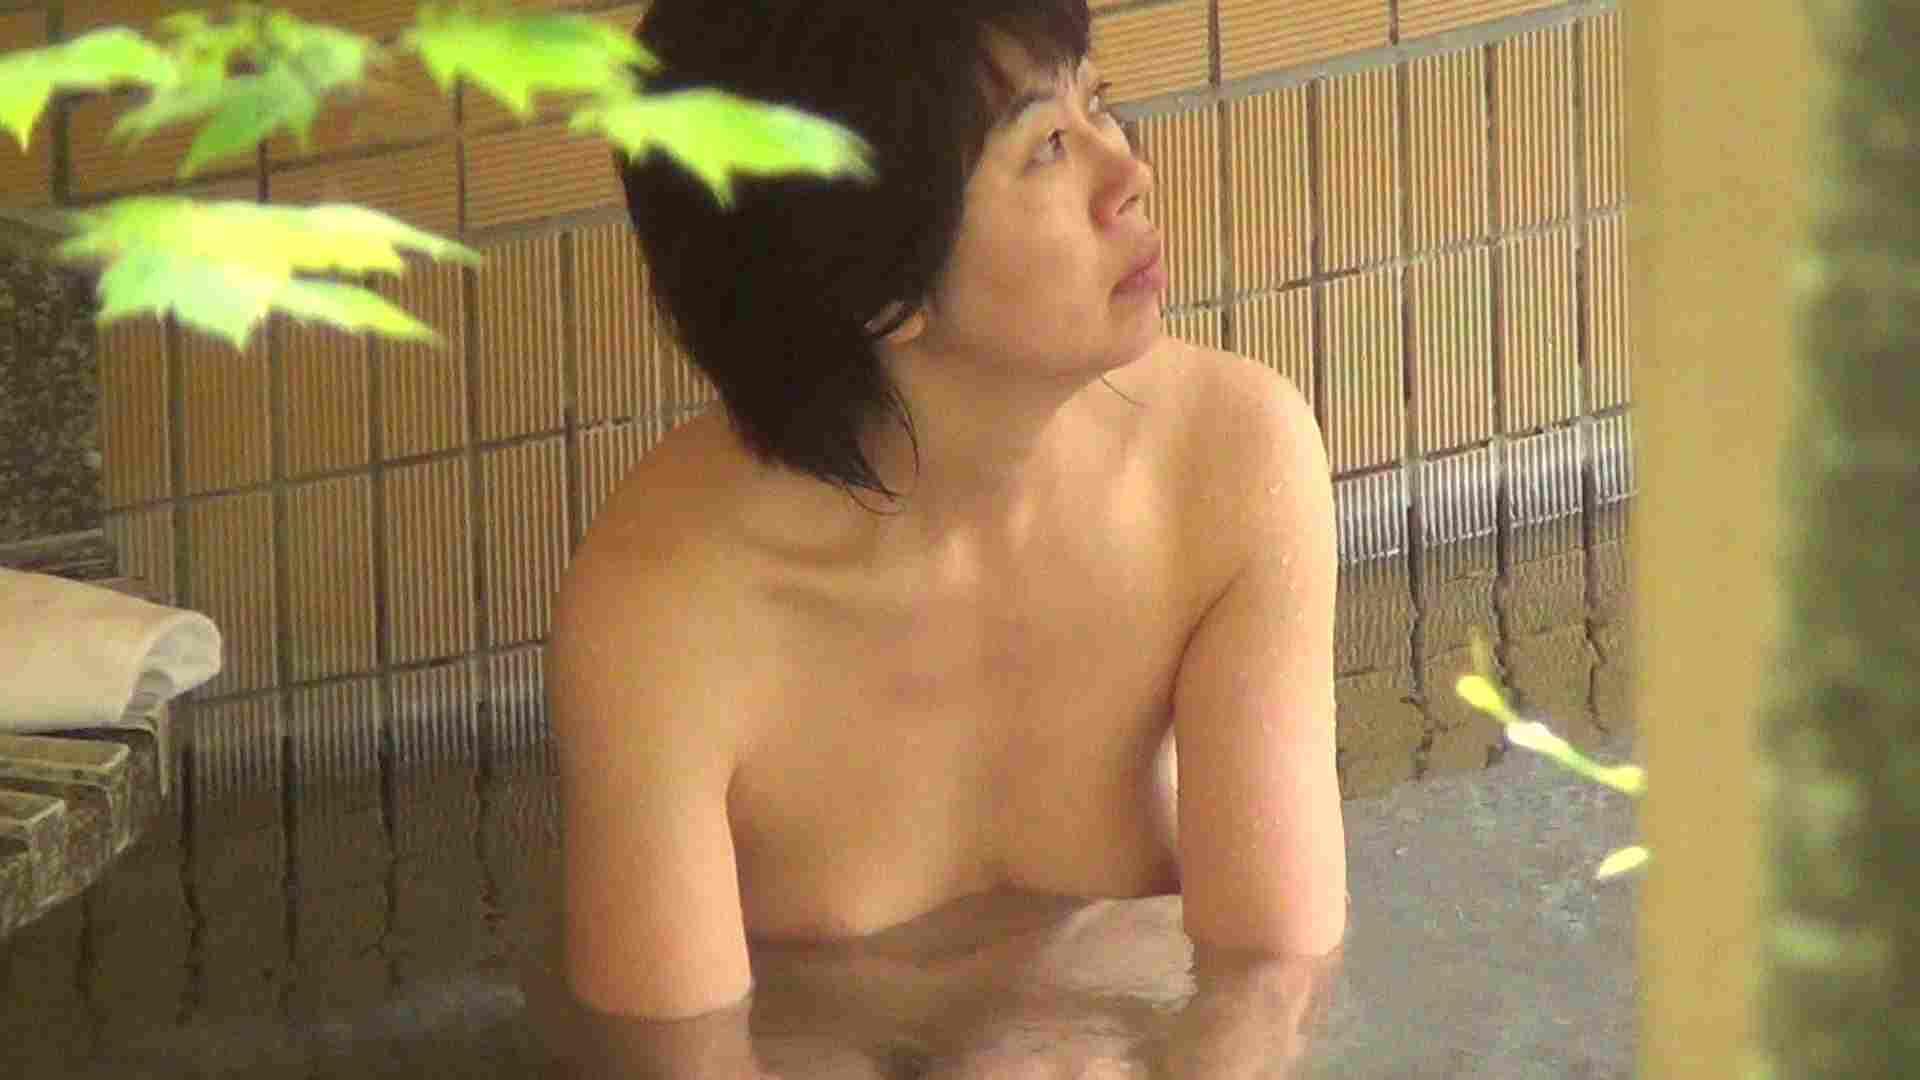 Aquaな露天風呂Vol.247 OLのエロ生活 おめこ無修正画像 83連発 41